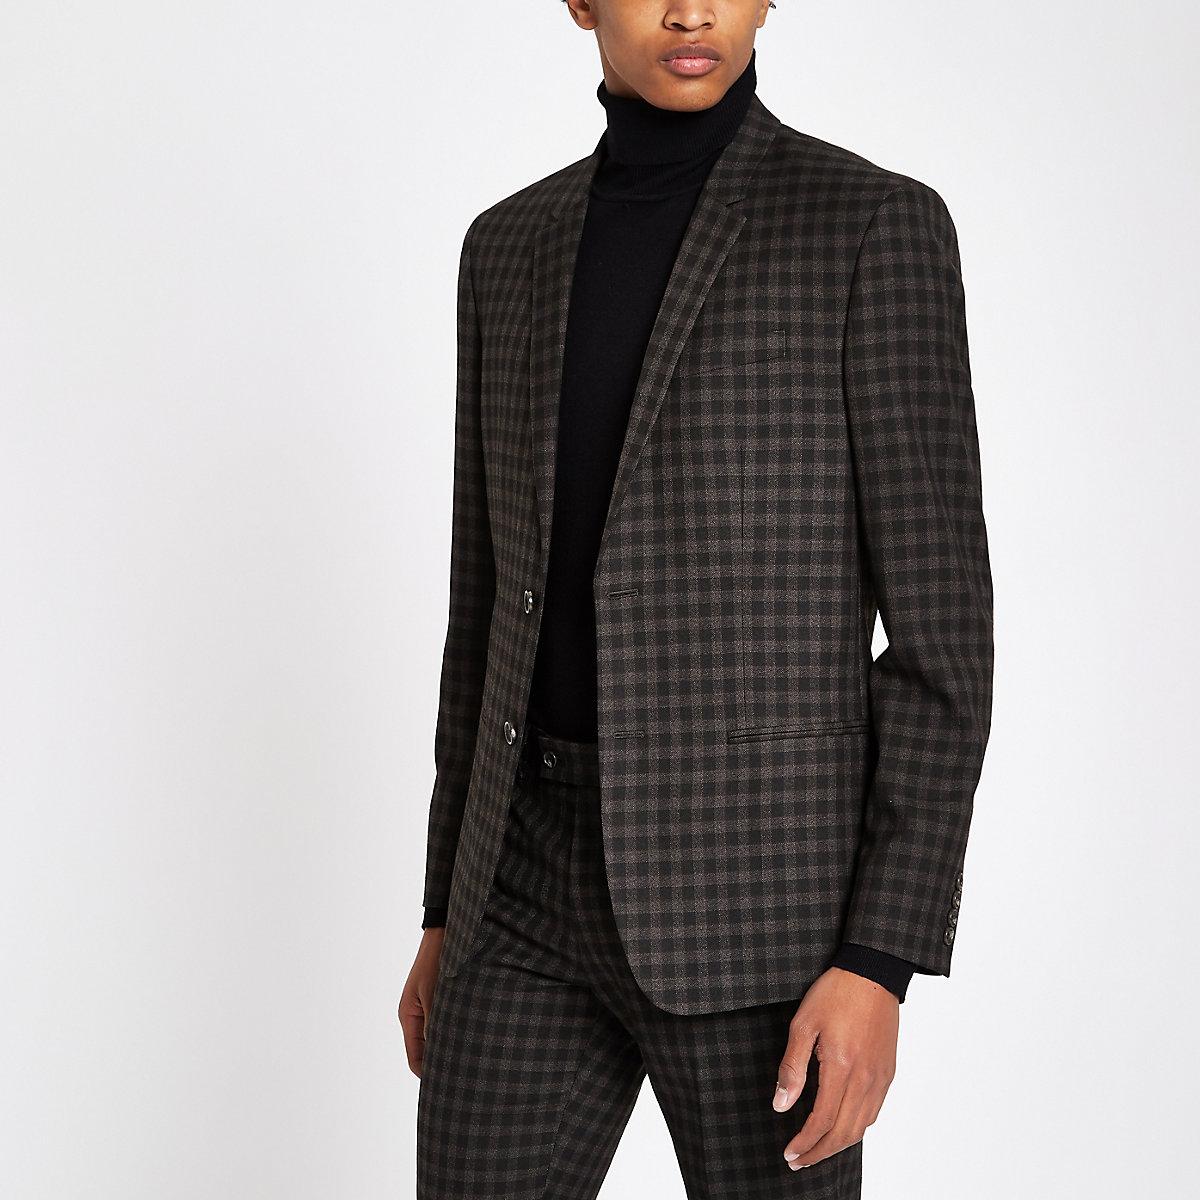 Brown check skinny fit suit jacket